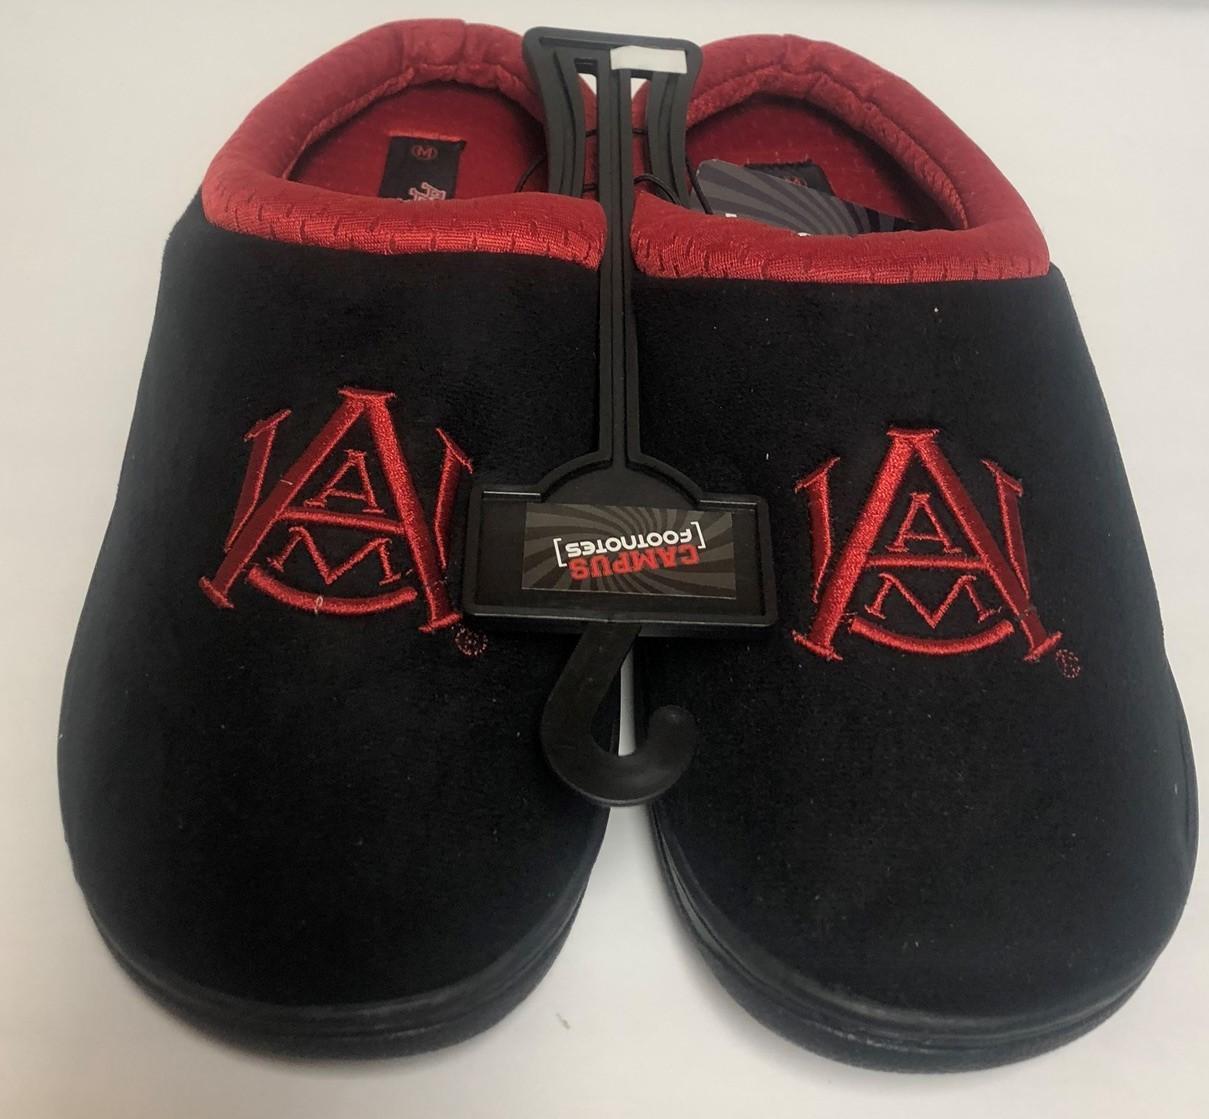 Alabama A&M University Men's Slippers Shoes Sz 9/10 image 3